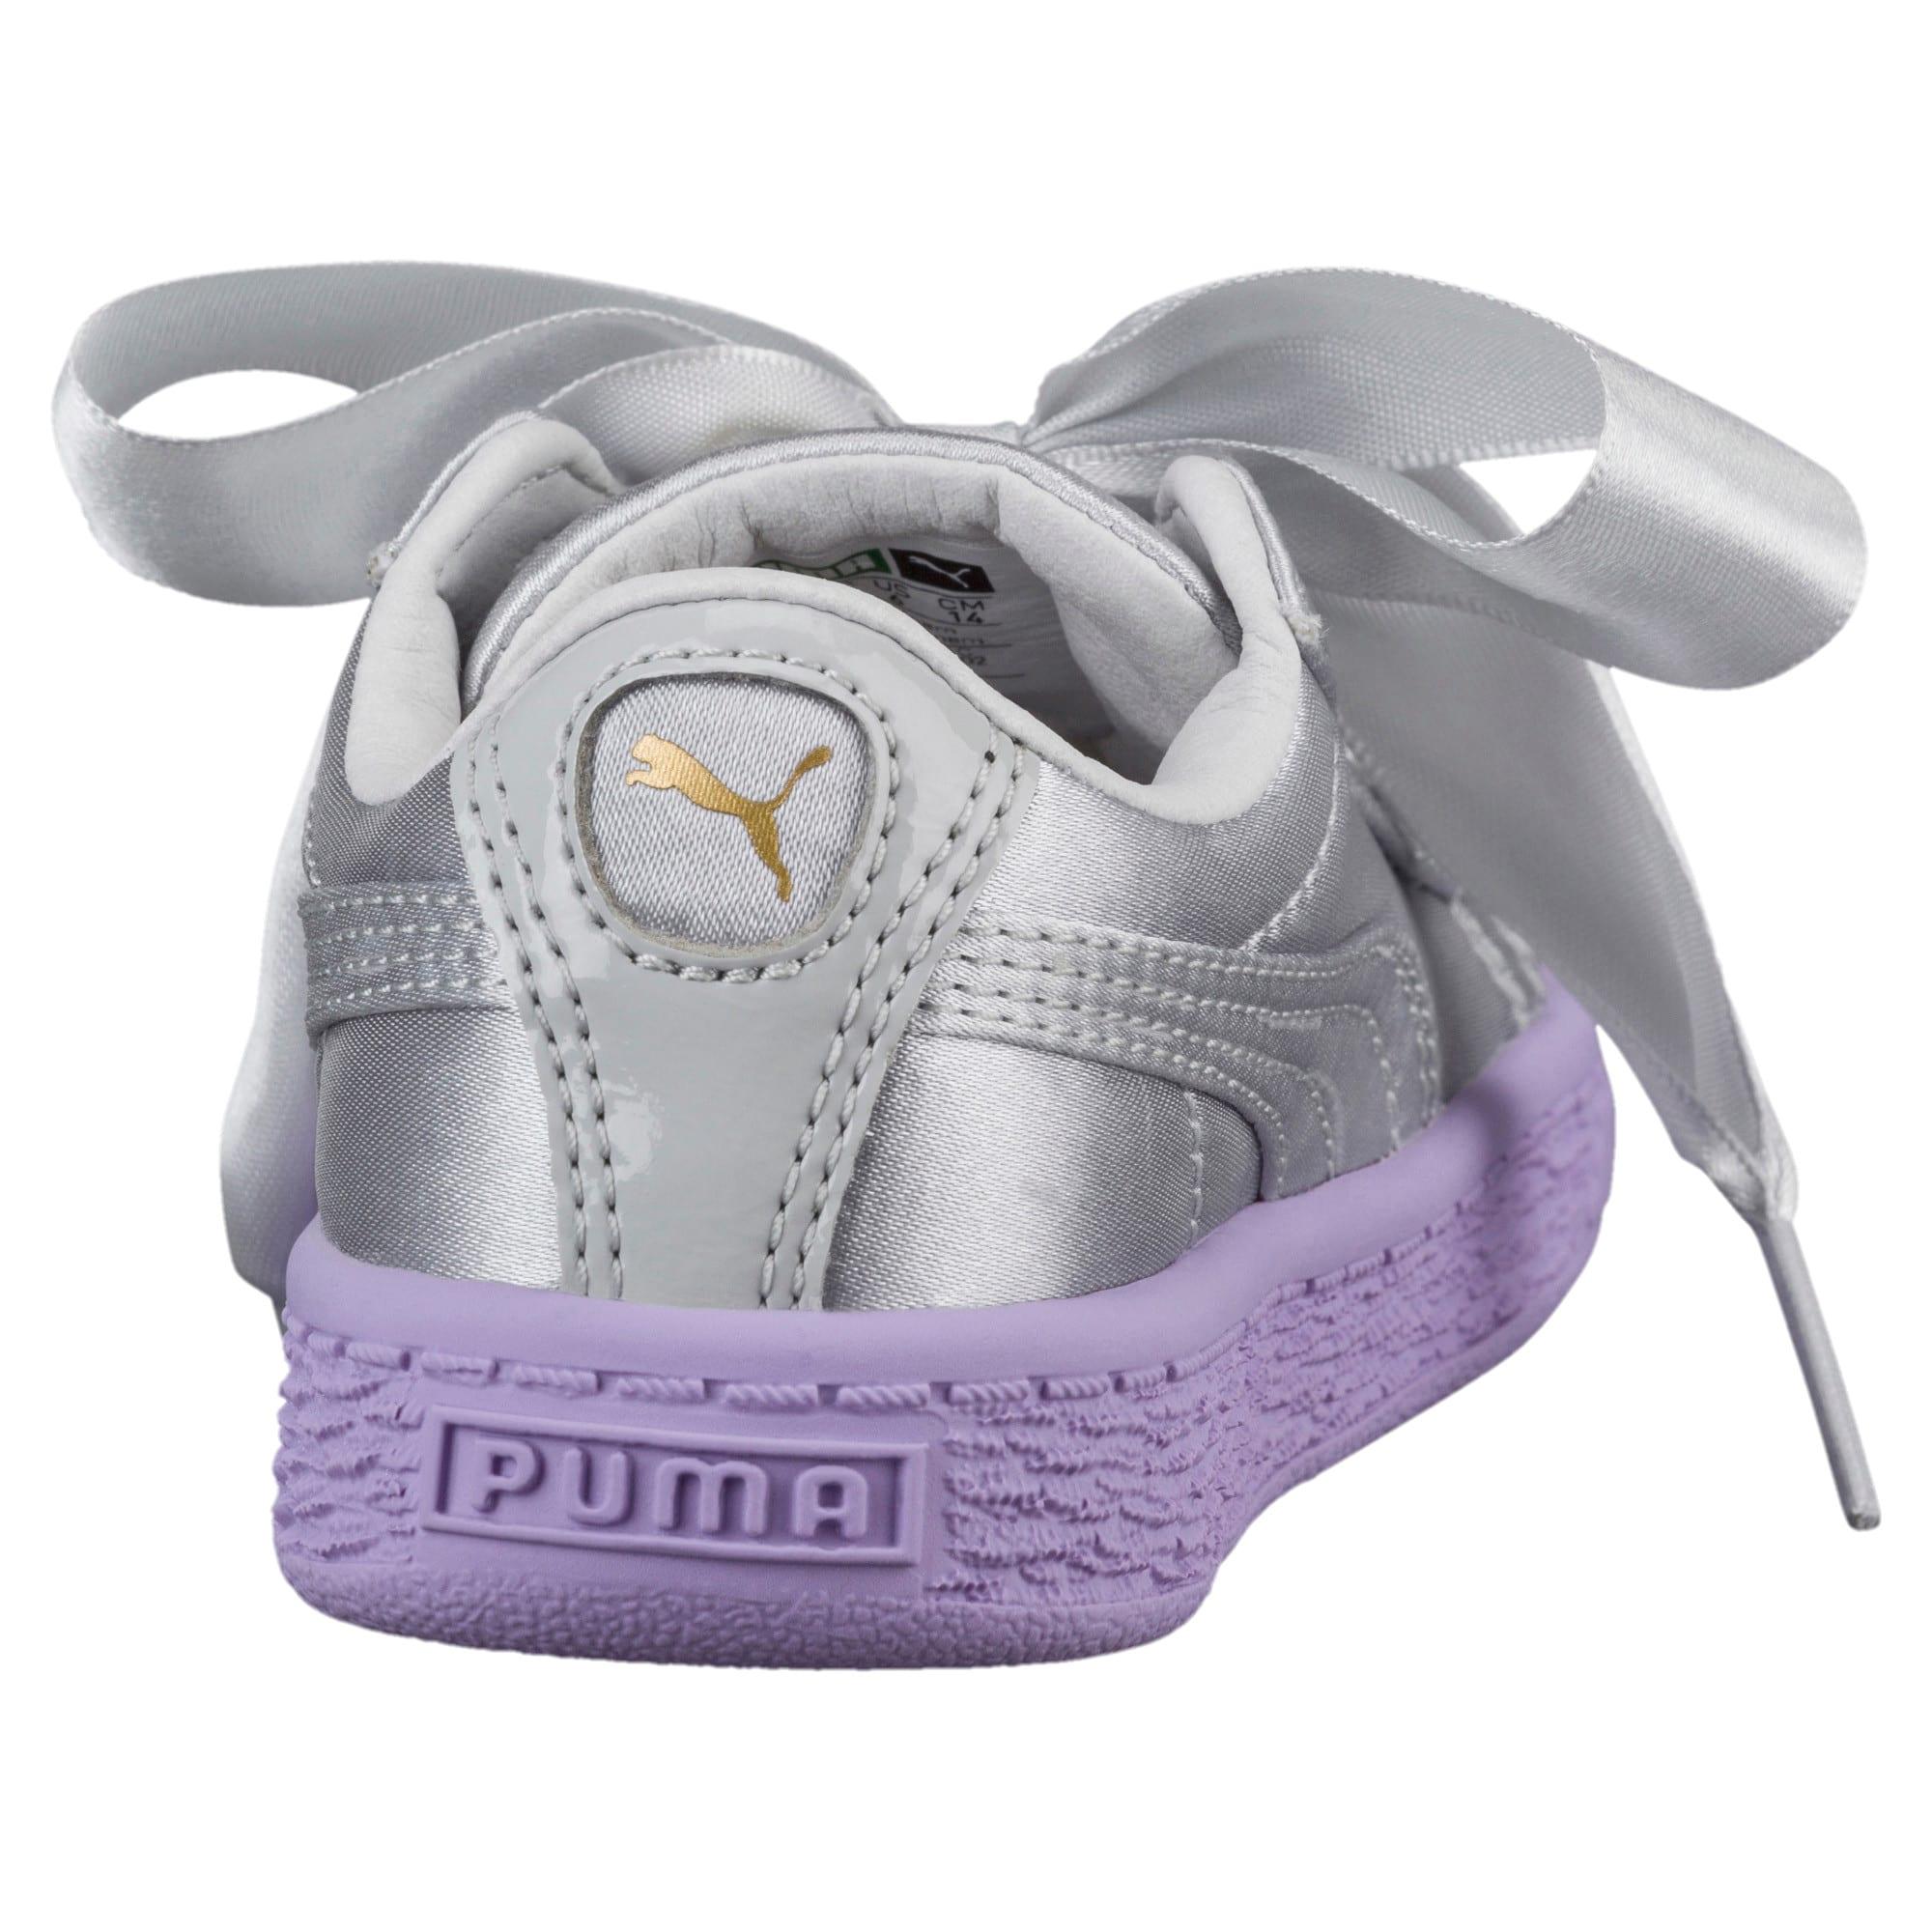 Thumbnail 4 of Basket Heart Toddler Shoes, Glacier Gray-Glacier Gray, medium